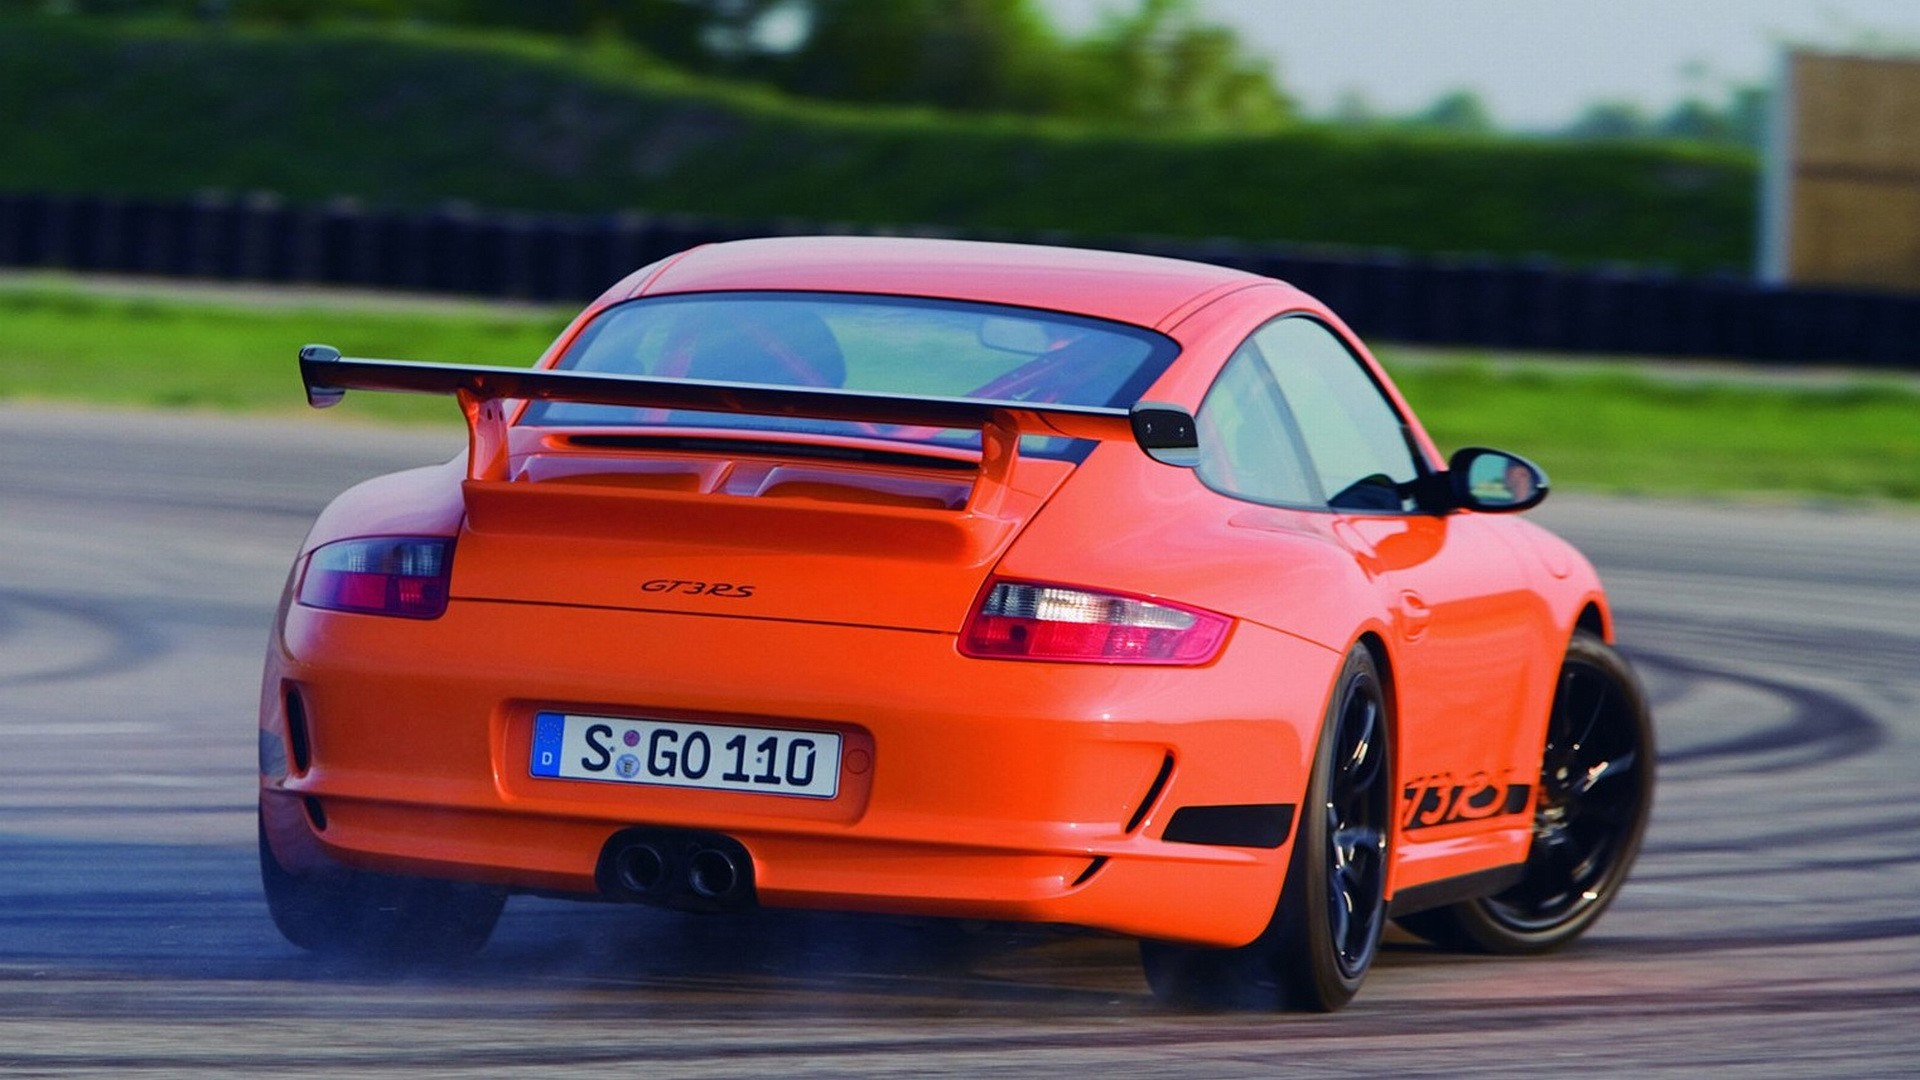 Porsche 911 Gt3 Rs Wallpaper: Porsche Gt3 Rs Wallpaper